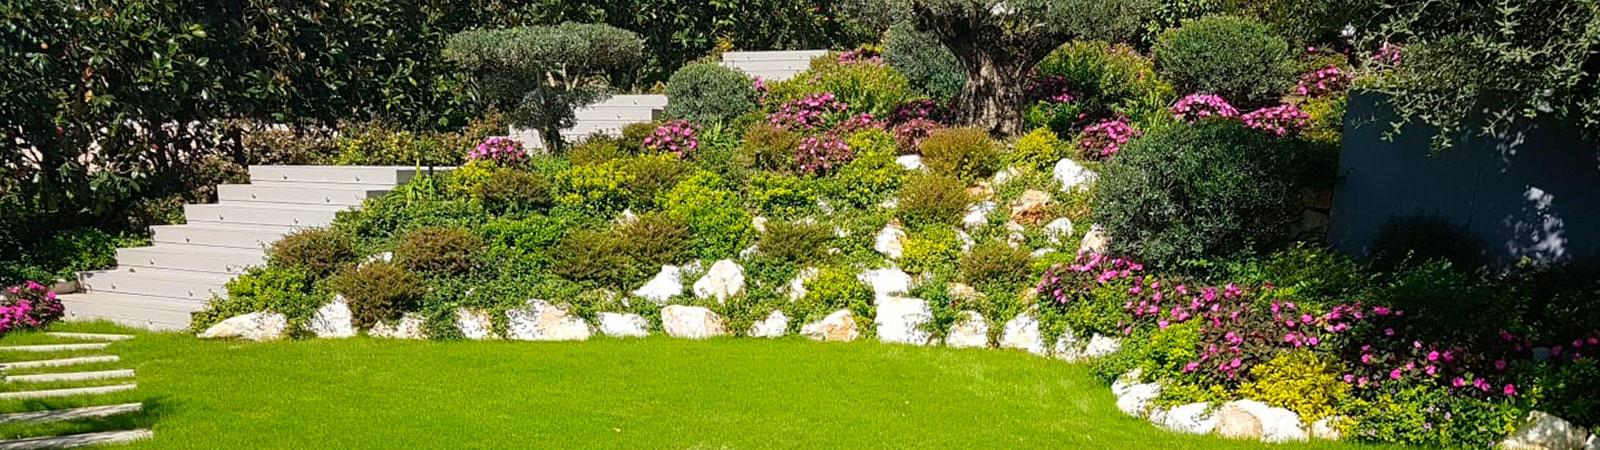 lanscape garden Marbella